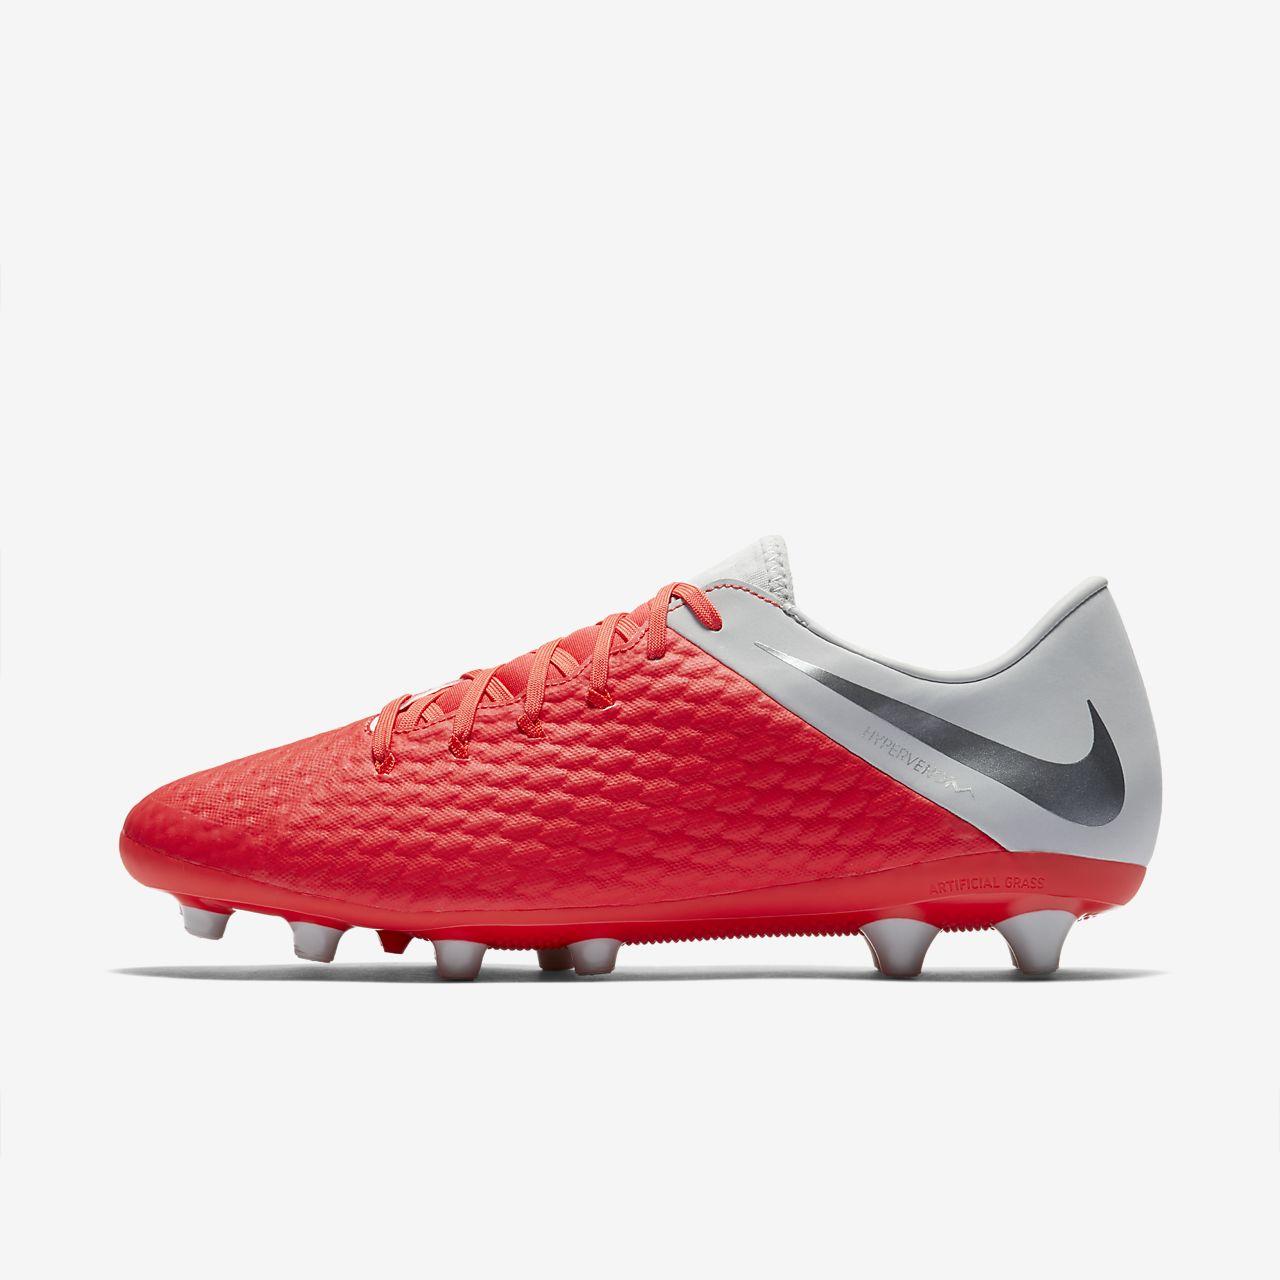 Pro Crampons Academy Nike Terrain À Iii Hypervenom Pour Synthétique Chaussure Ag De Football erxQCdWBo